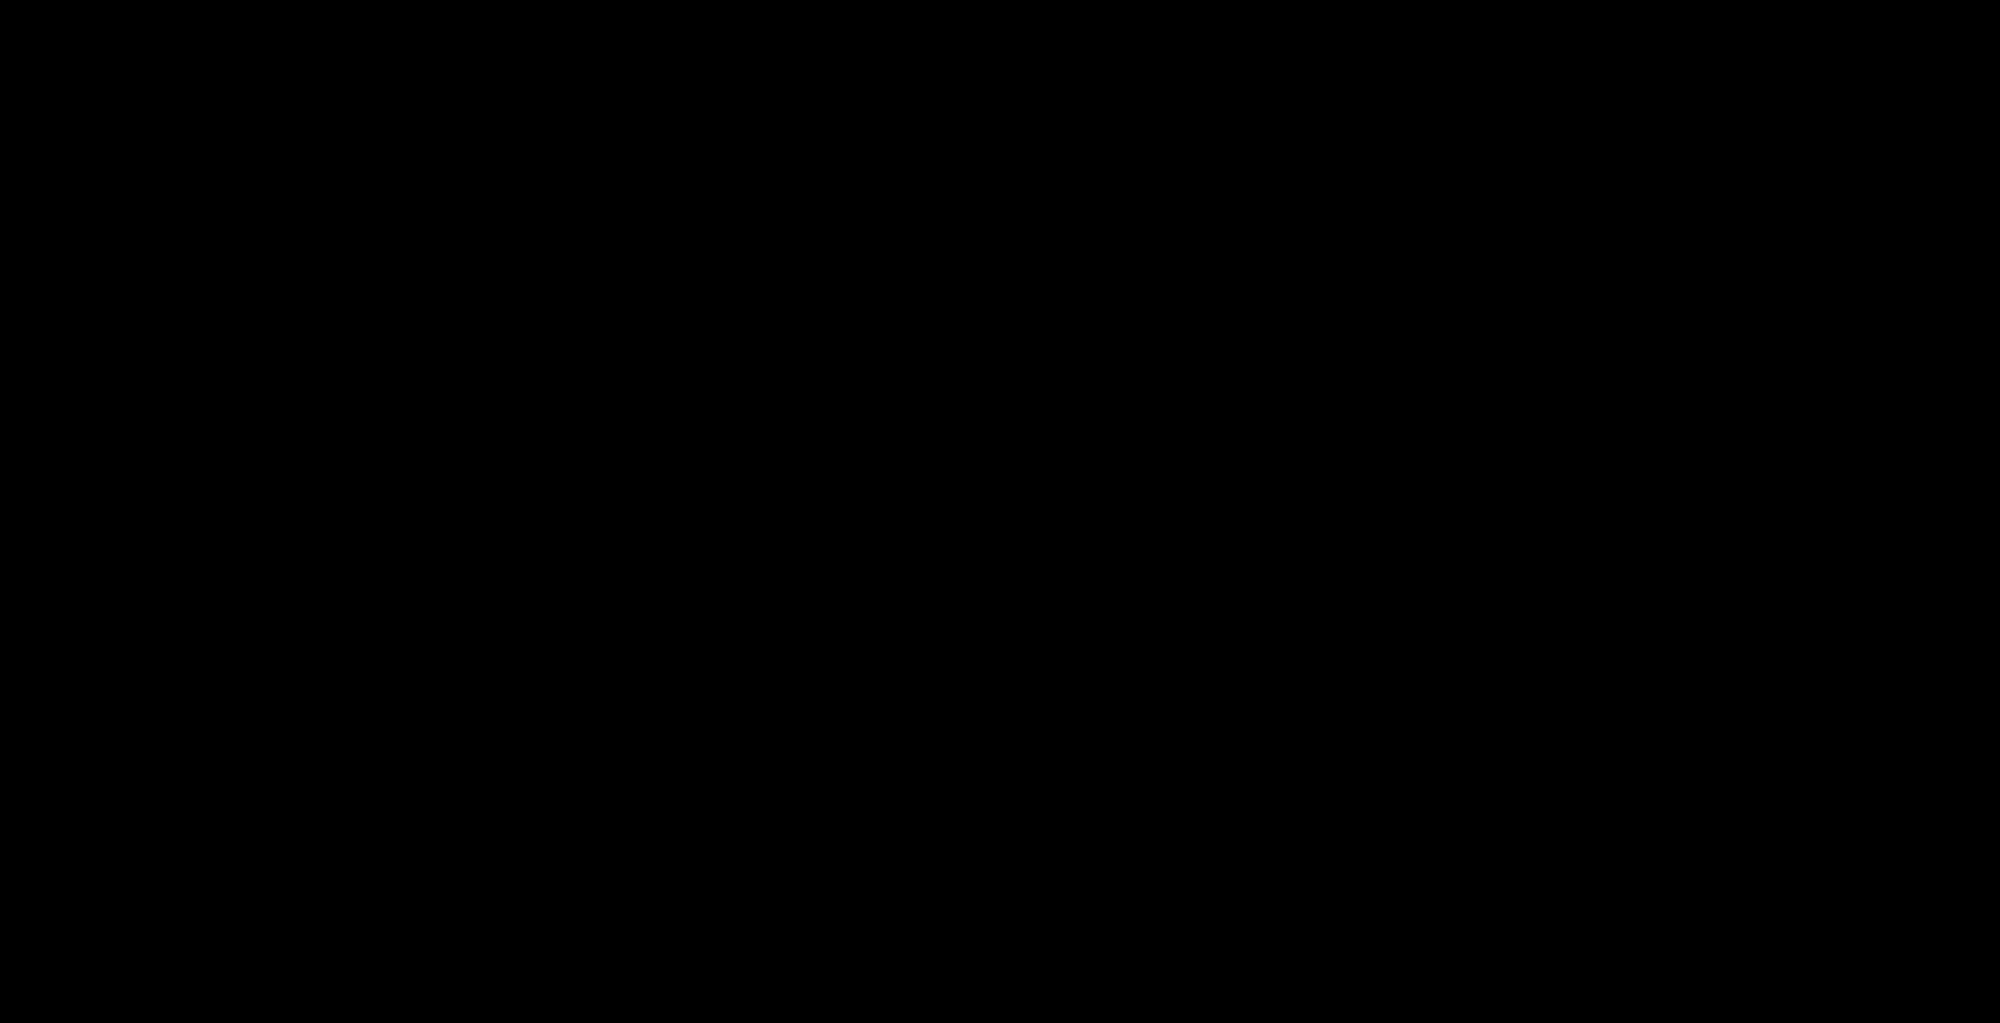 Vhs Logo Logos Vhs Typo Logo